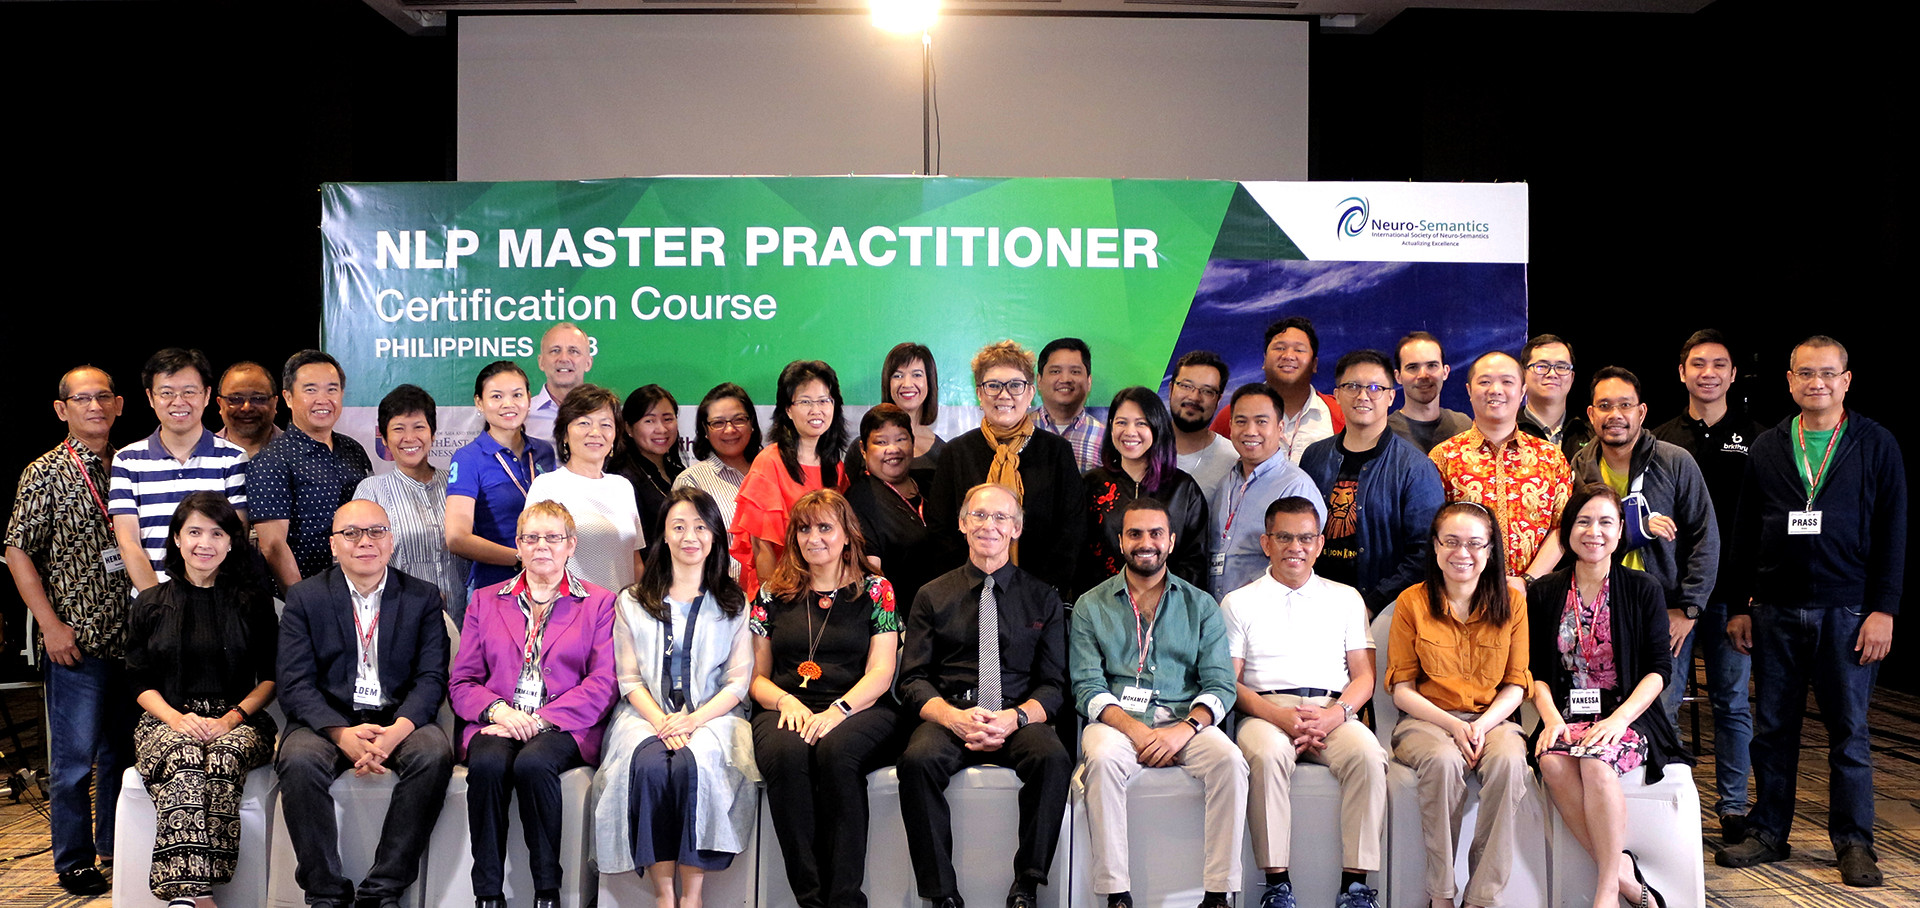 NLP Master Prac Photo 1.jpg